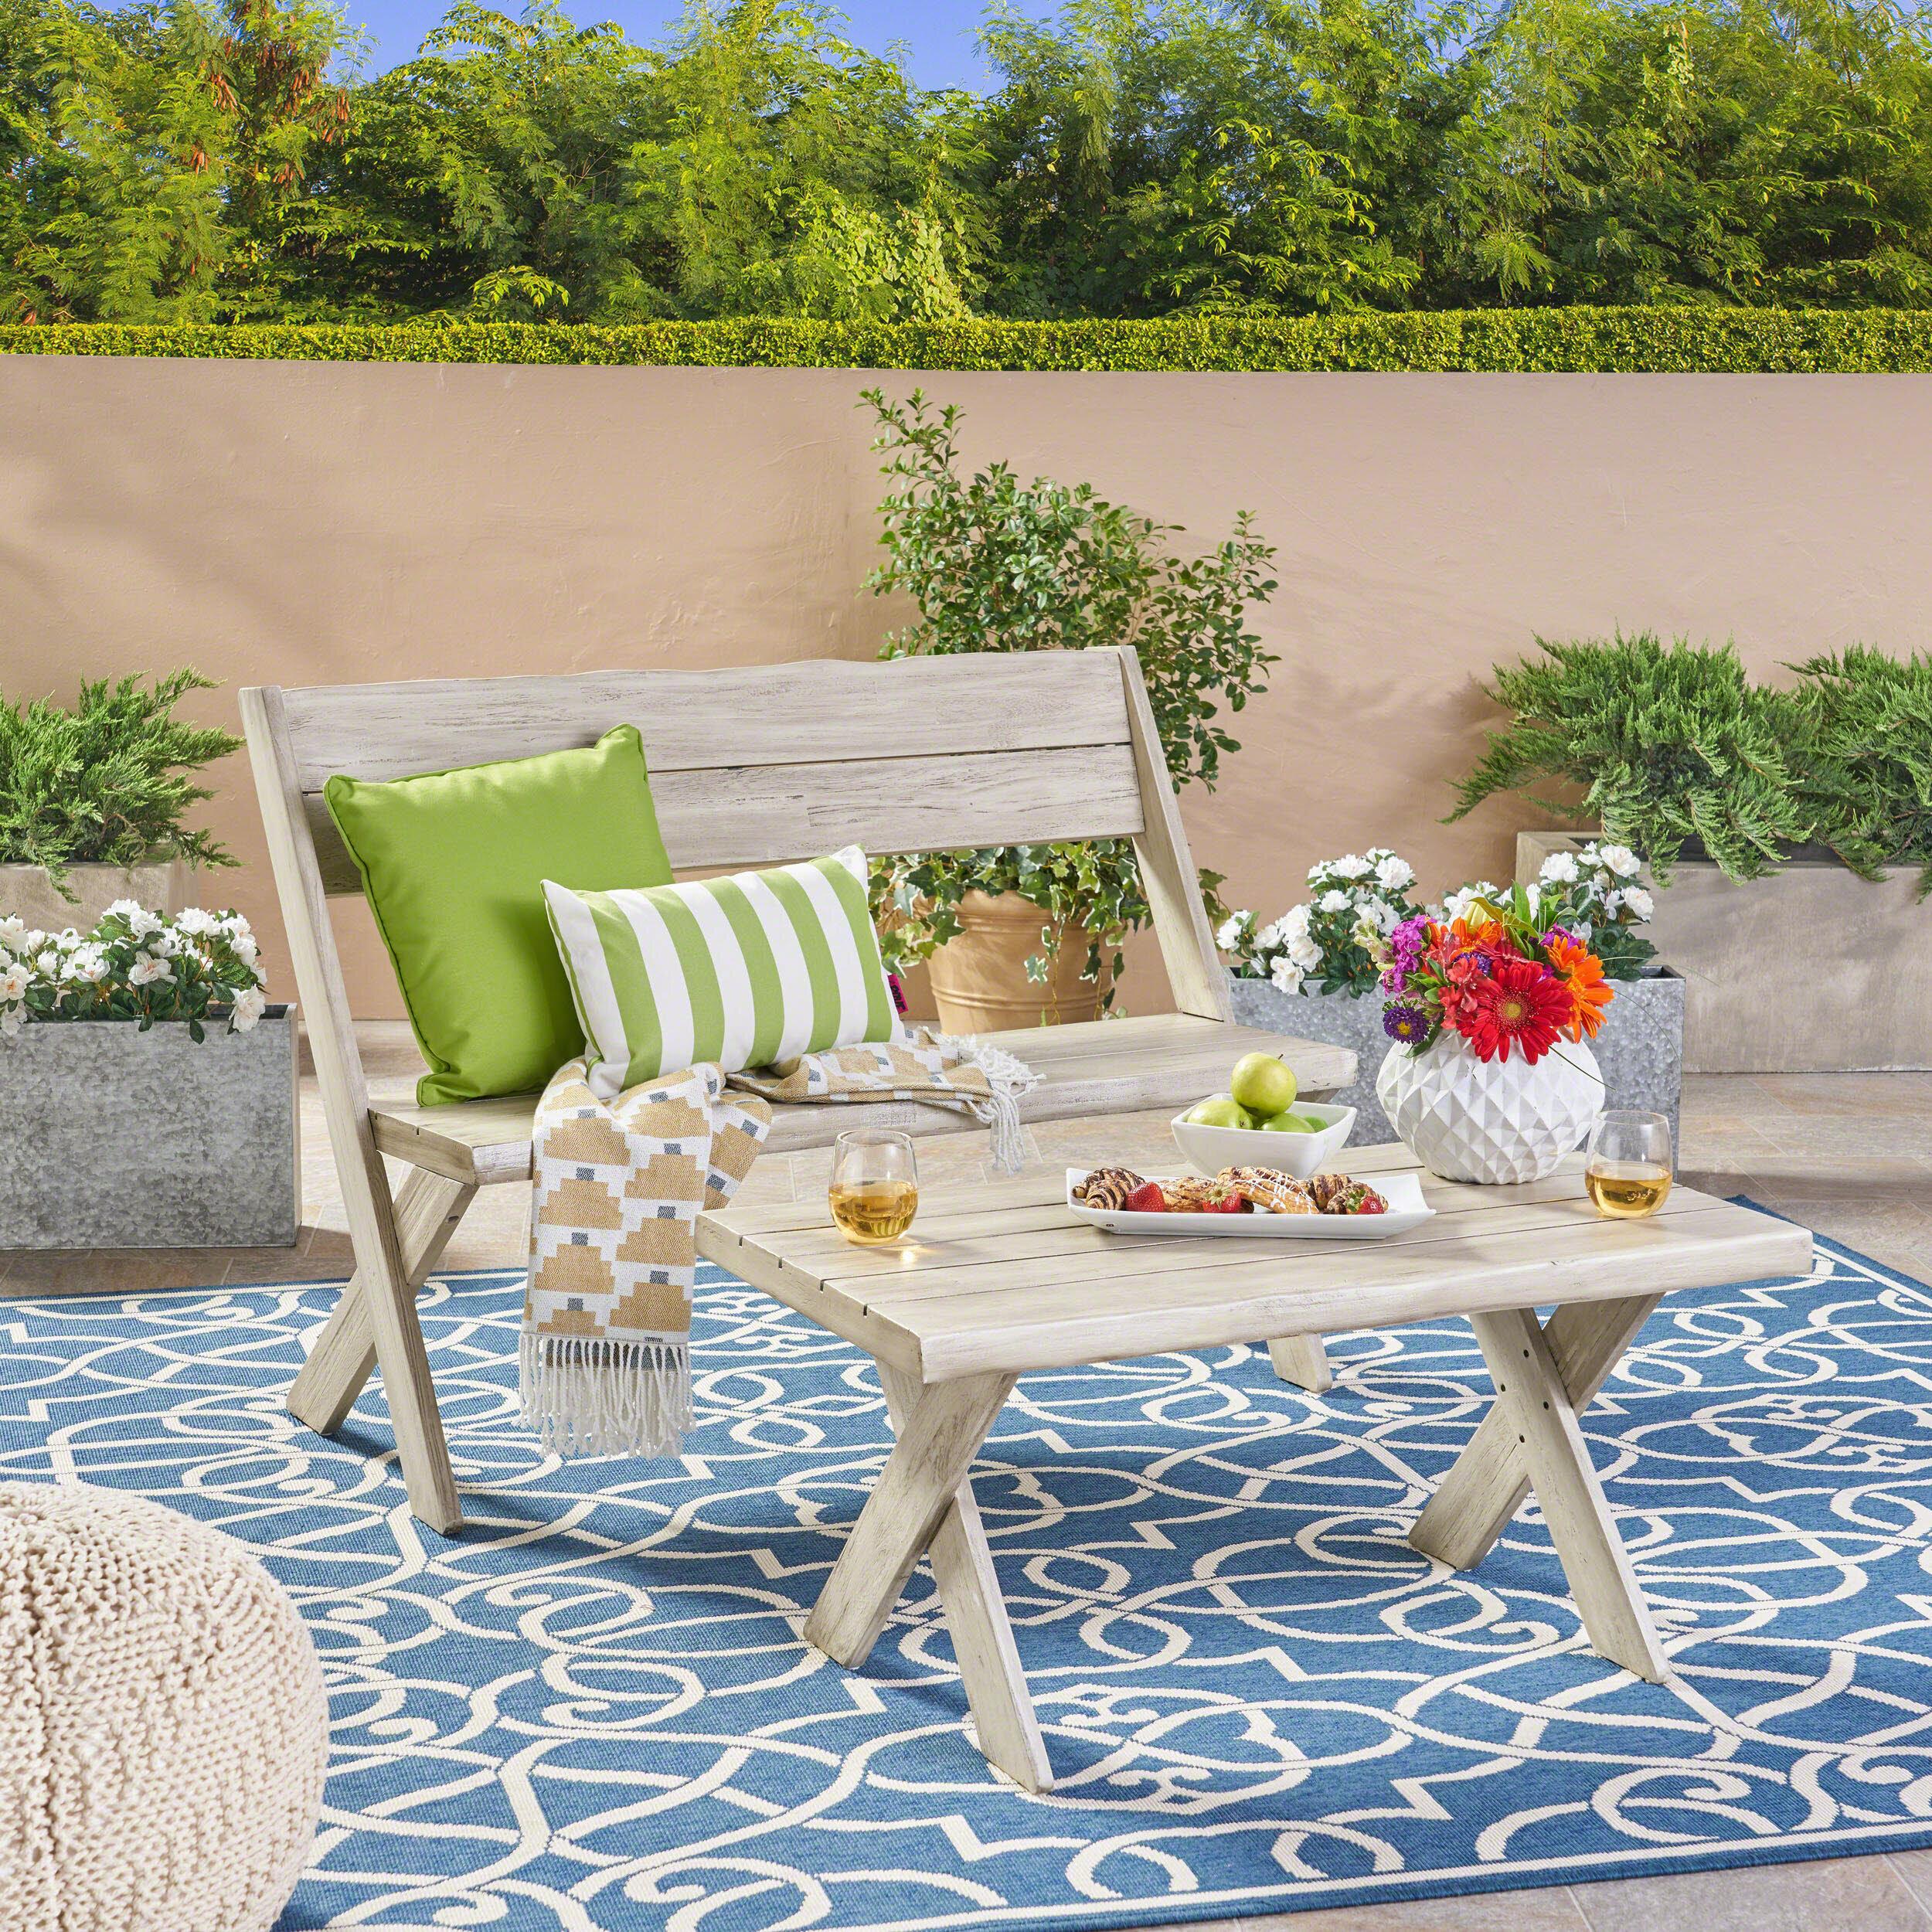 Fantastic Eltingville Outdoor Acacia Wood Loveseat And Coffee Table Set Evergreenethics Interior Chair Design Evergreenethicsorg